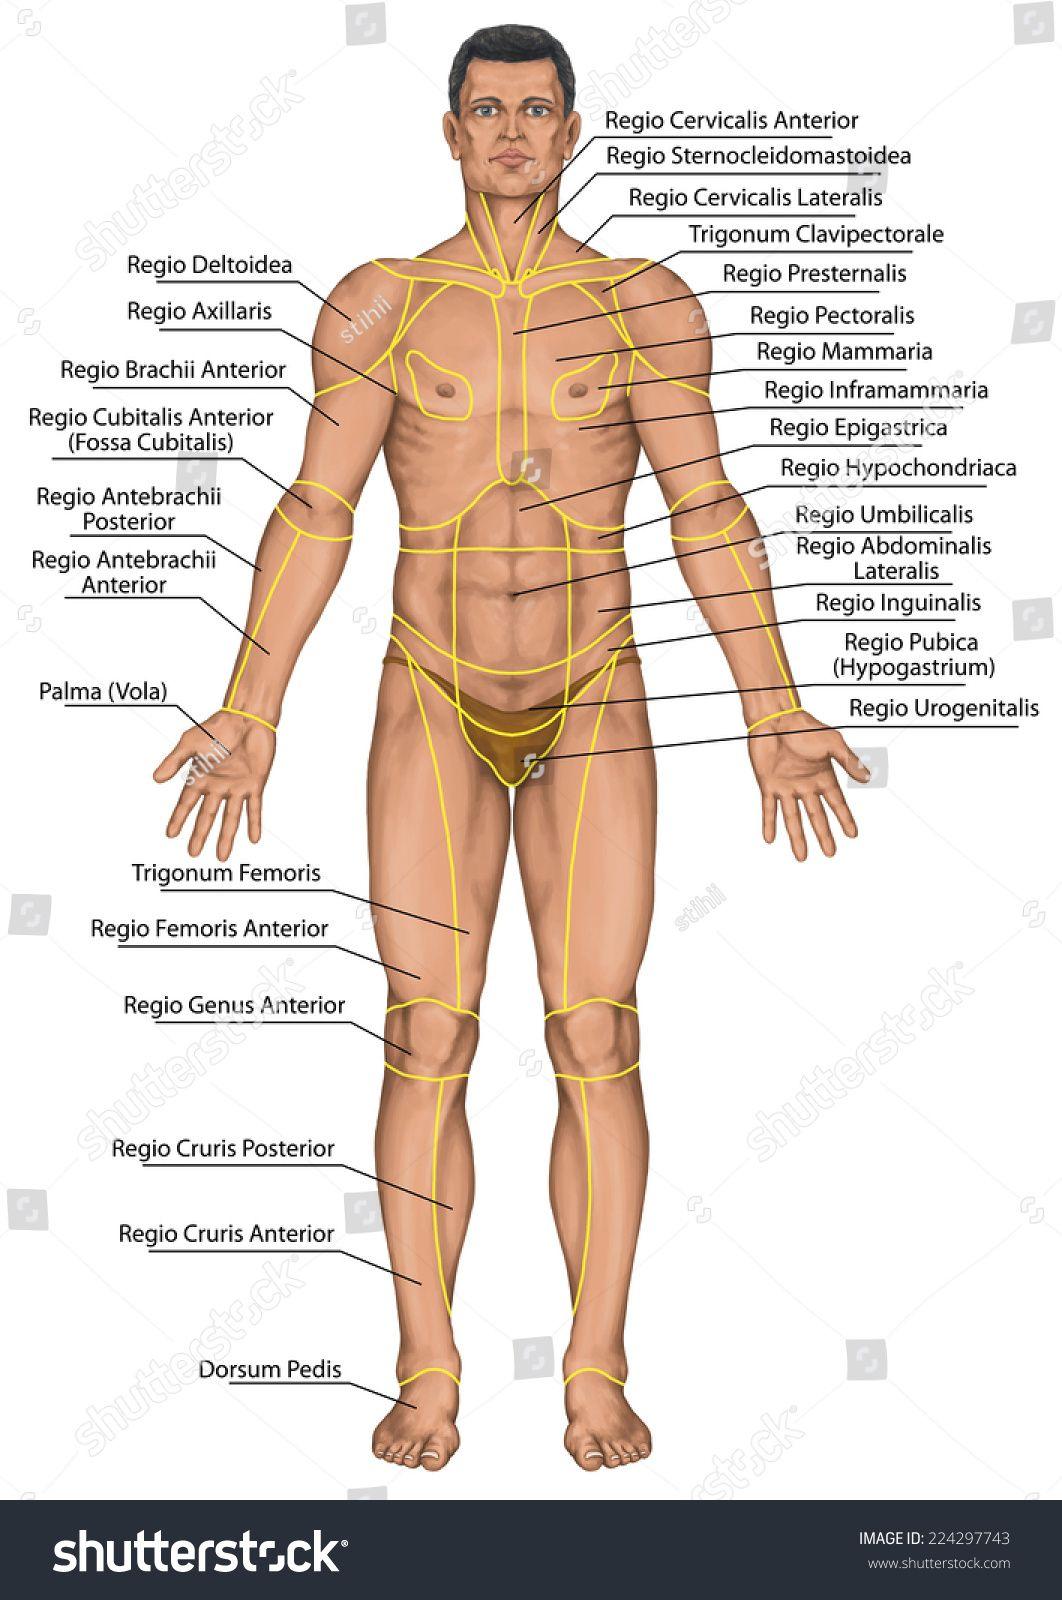 Male Human Anatomy Human Anatomy Pictures Human Body Anatomy